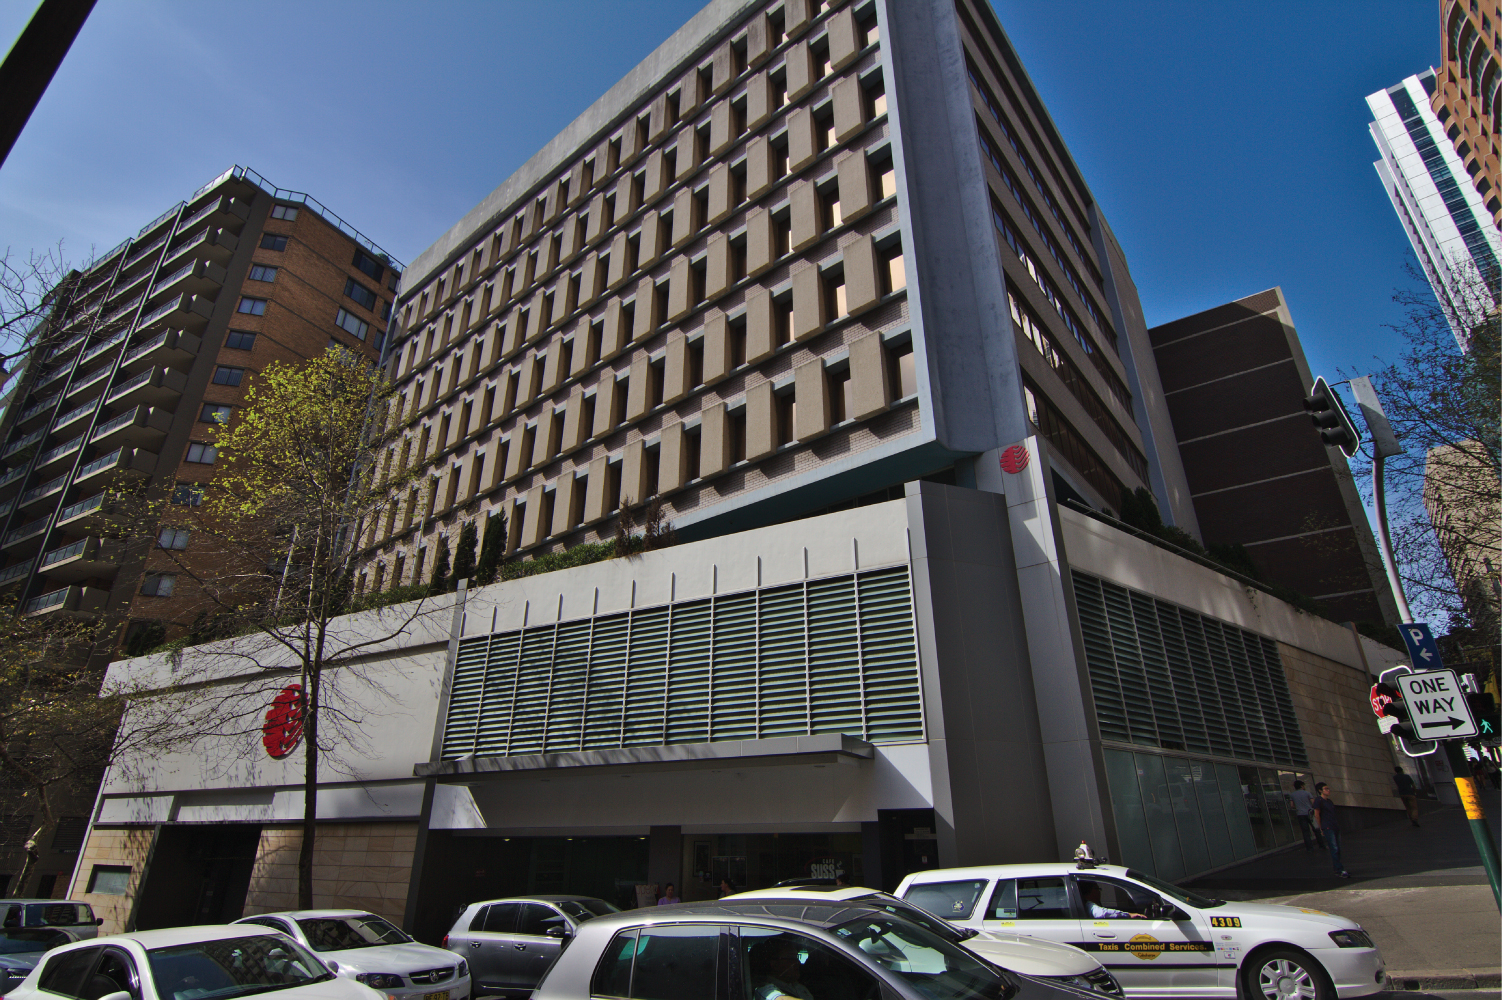 SAI Global receives no final bid for the whole company